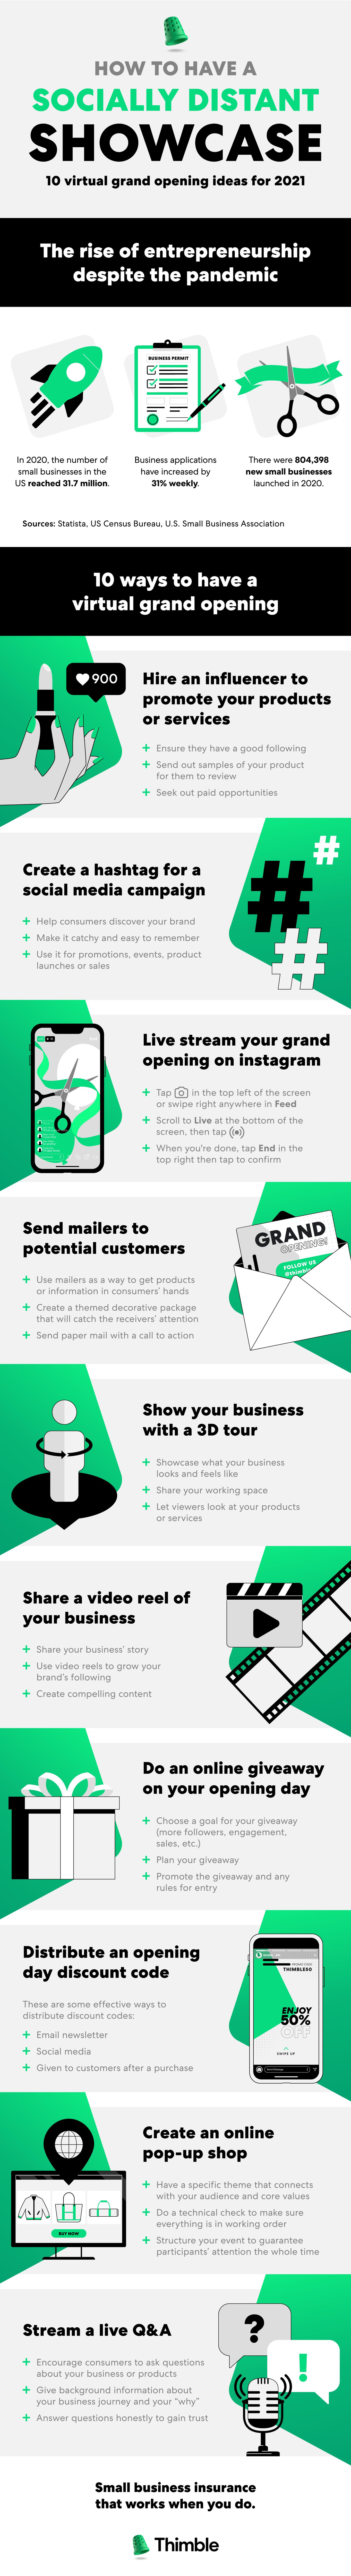 virtual-grand-opening-ideas